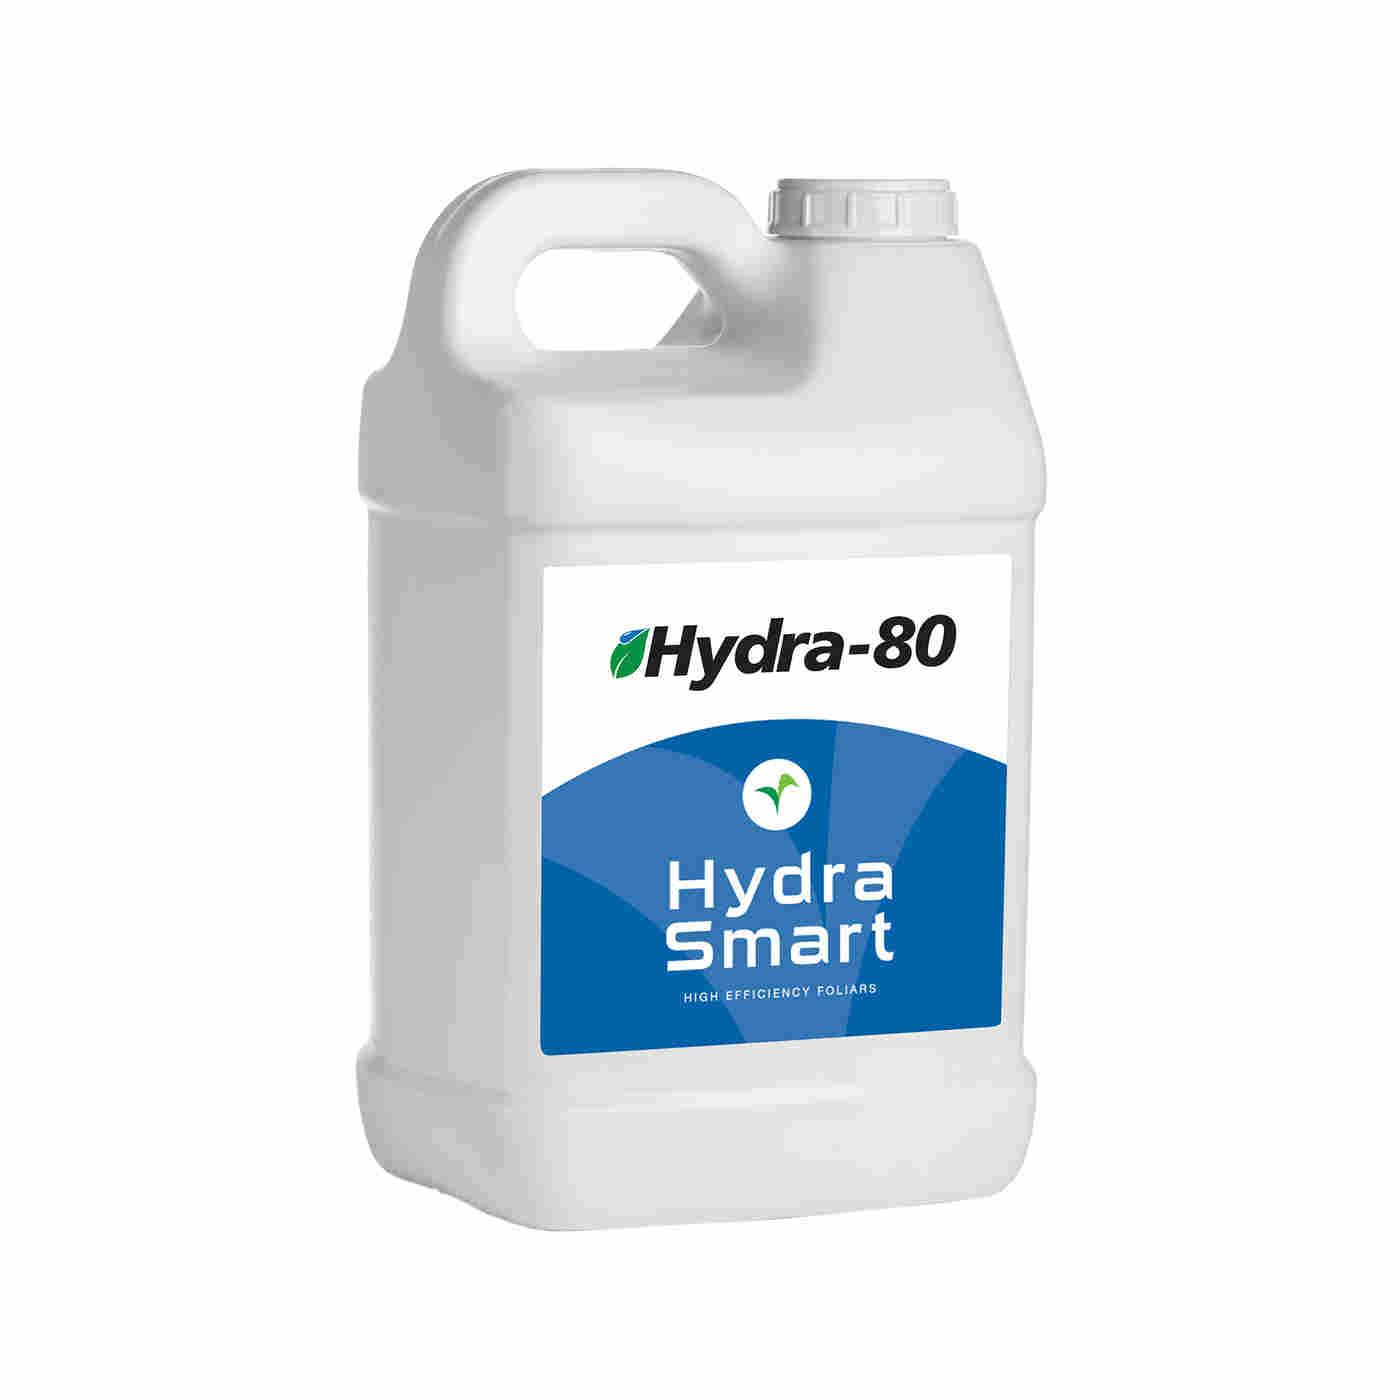 Hydra 80 2017